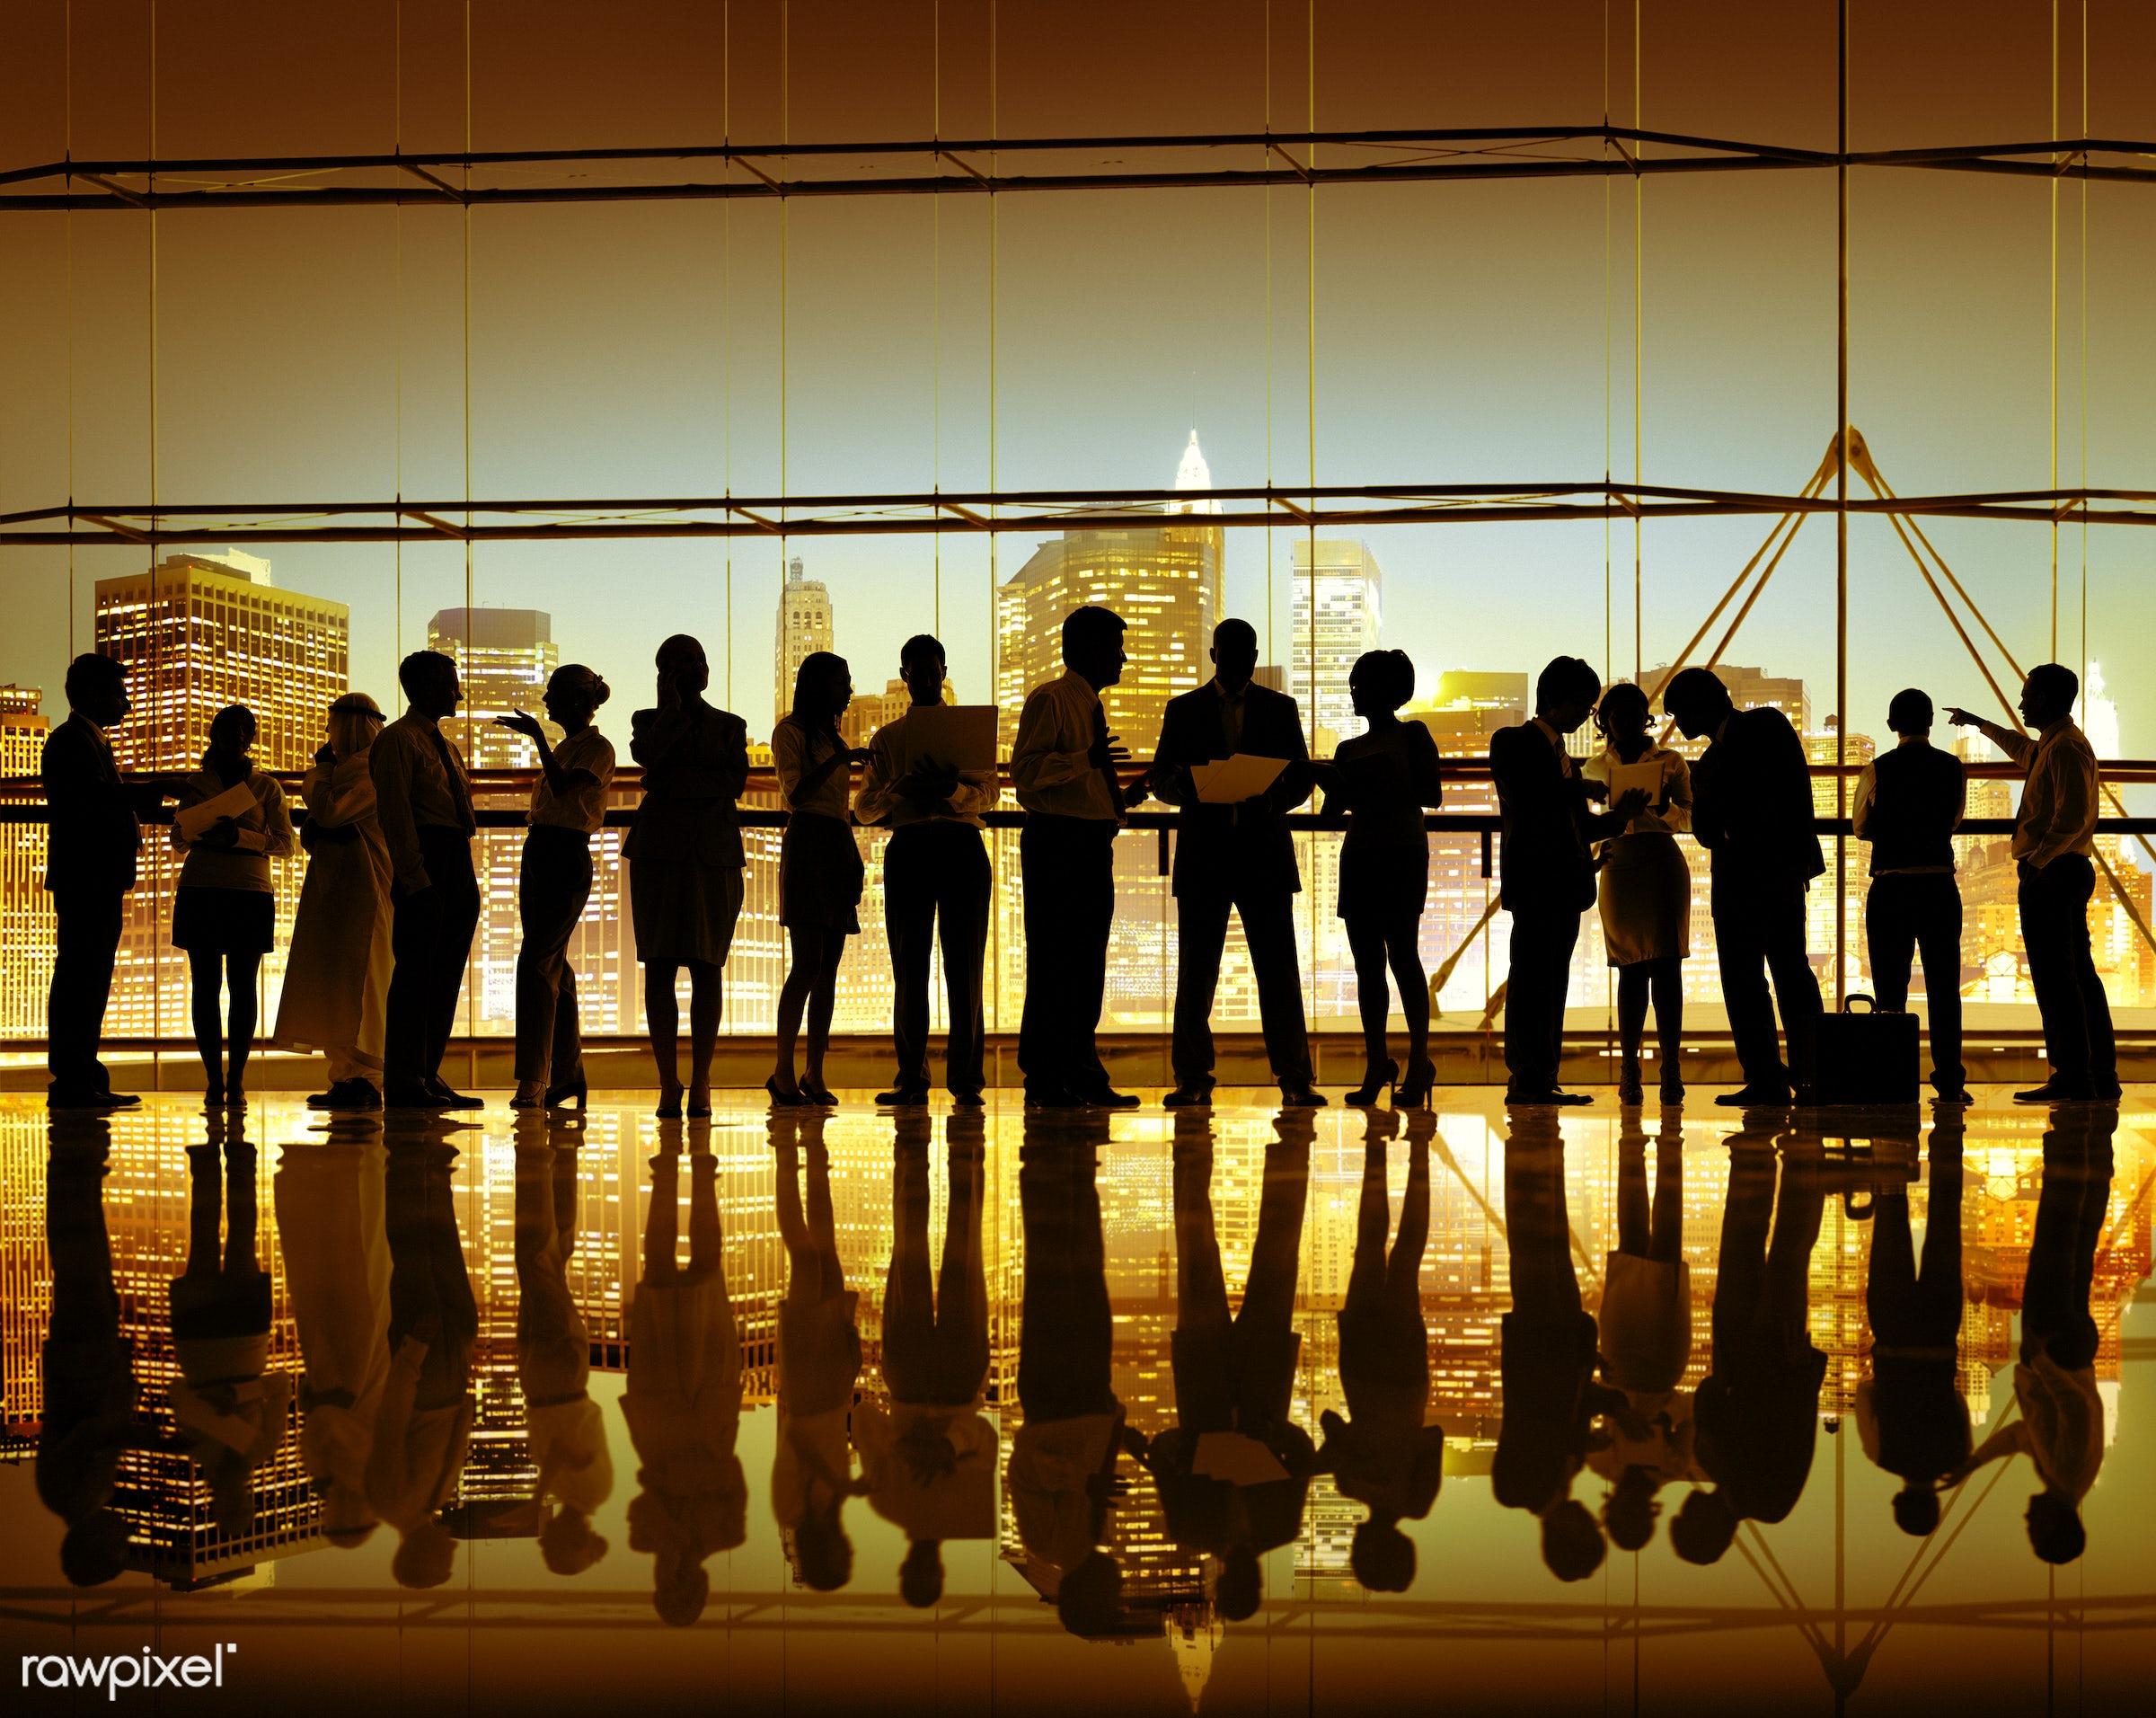 brainstorming, building, business, business people, businessmen, businesswomen, city, city life, cityscape, collaboration,...